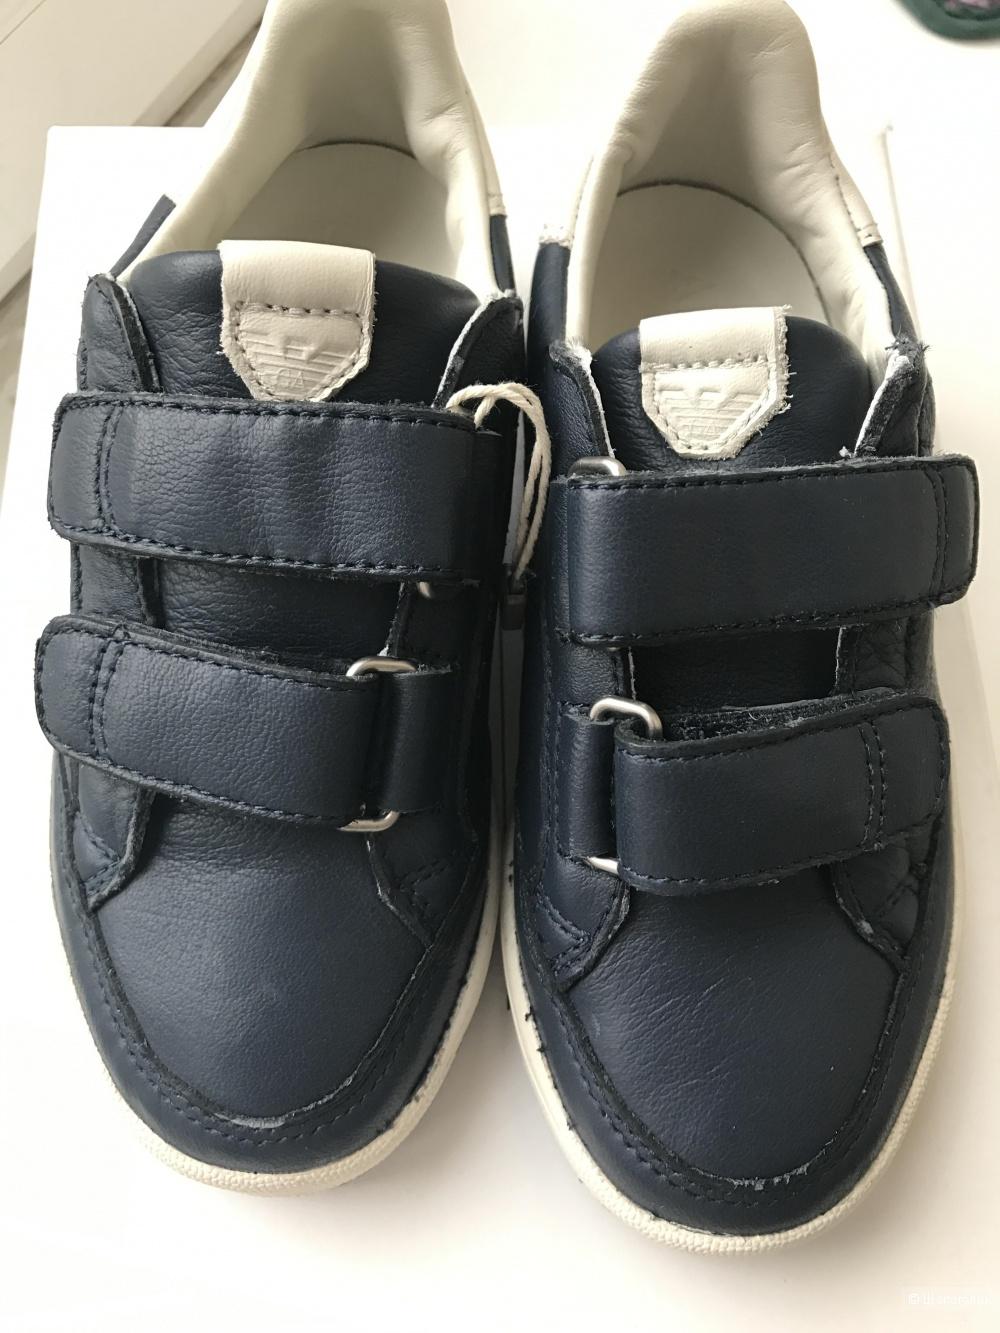 Кроссовки Armani juniors  29 размер